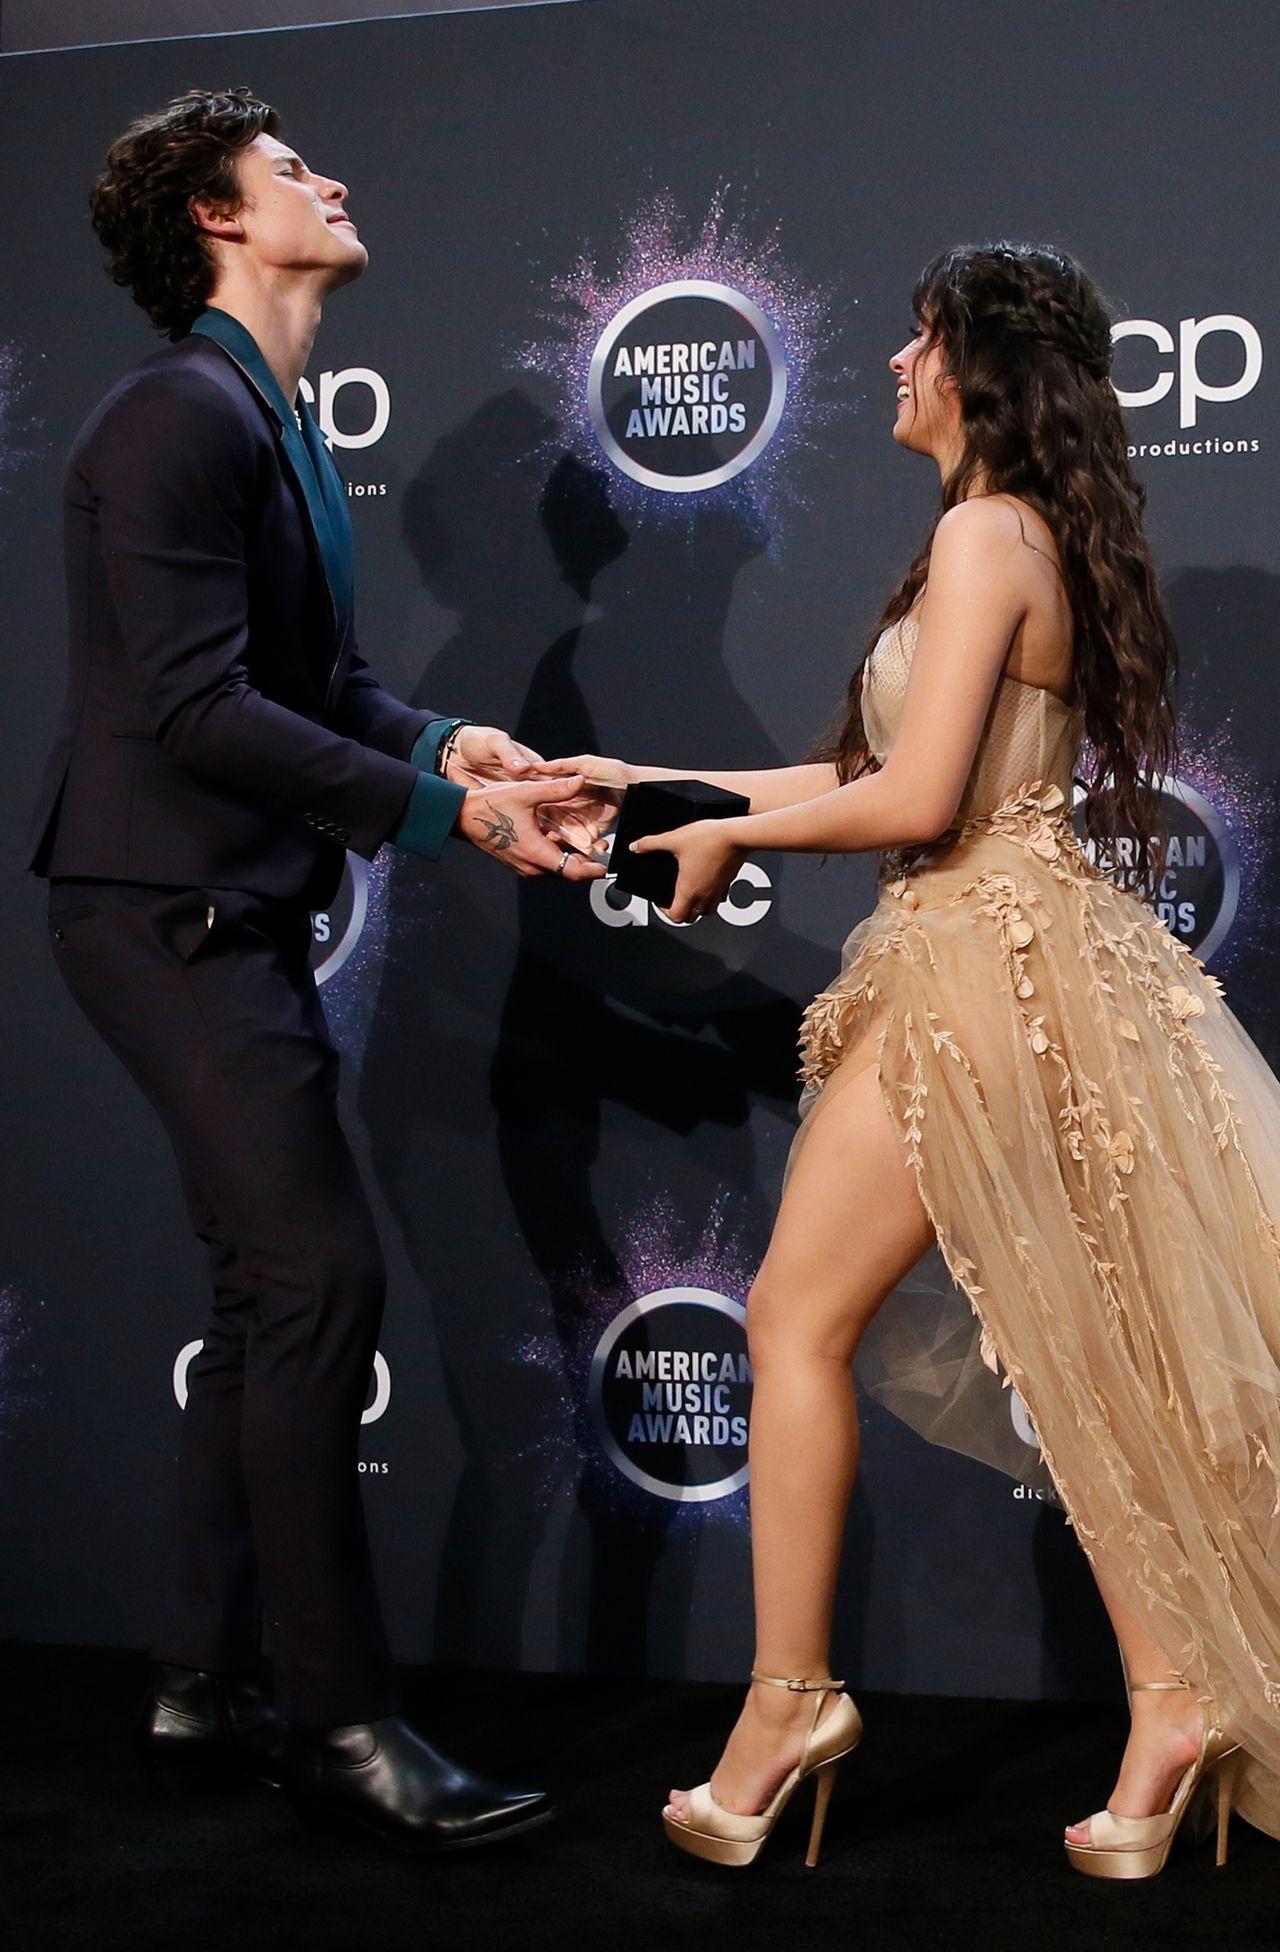 Camila Cabello i Shawn Mendes ze wspólną statuetką na rozdaniu nagród.